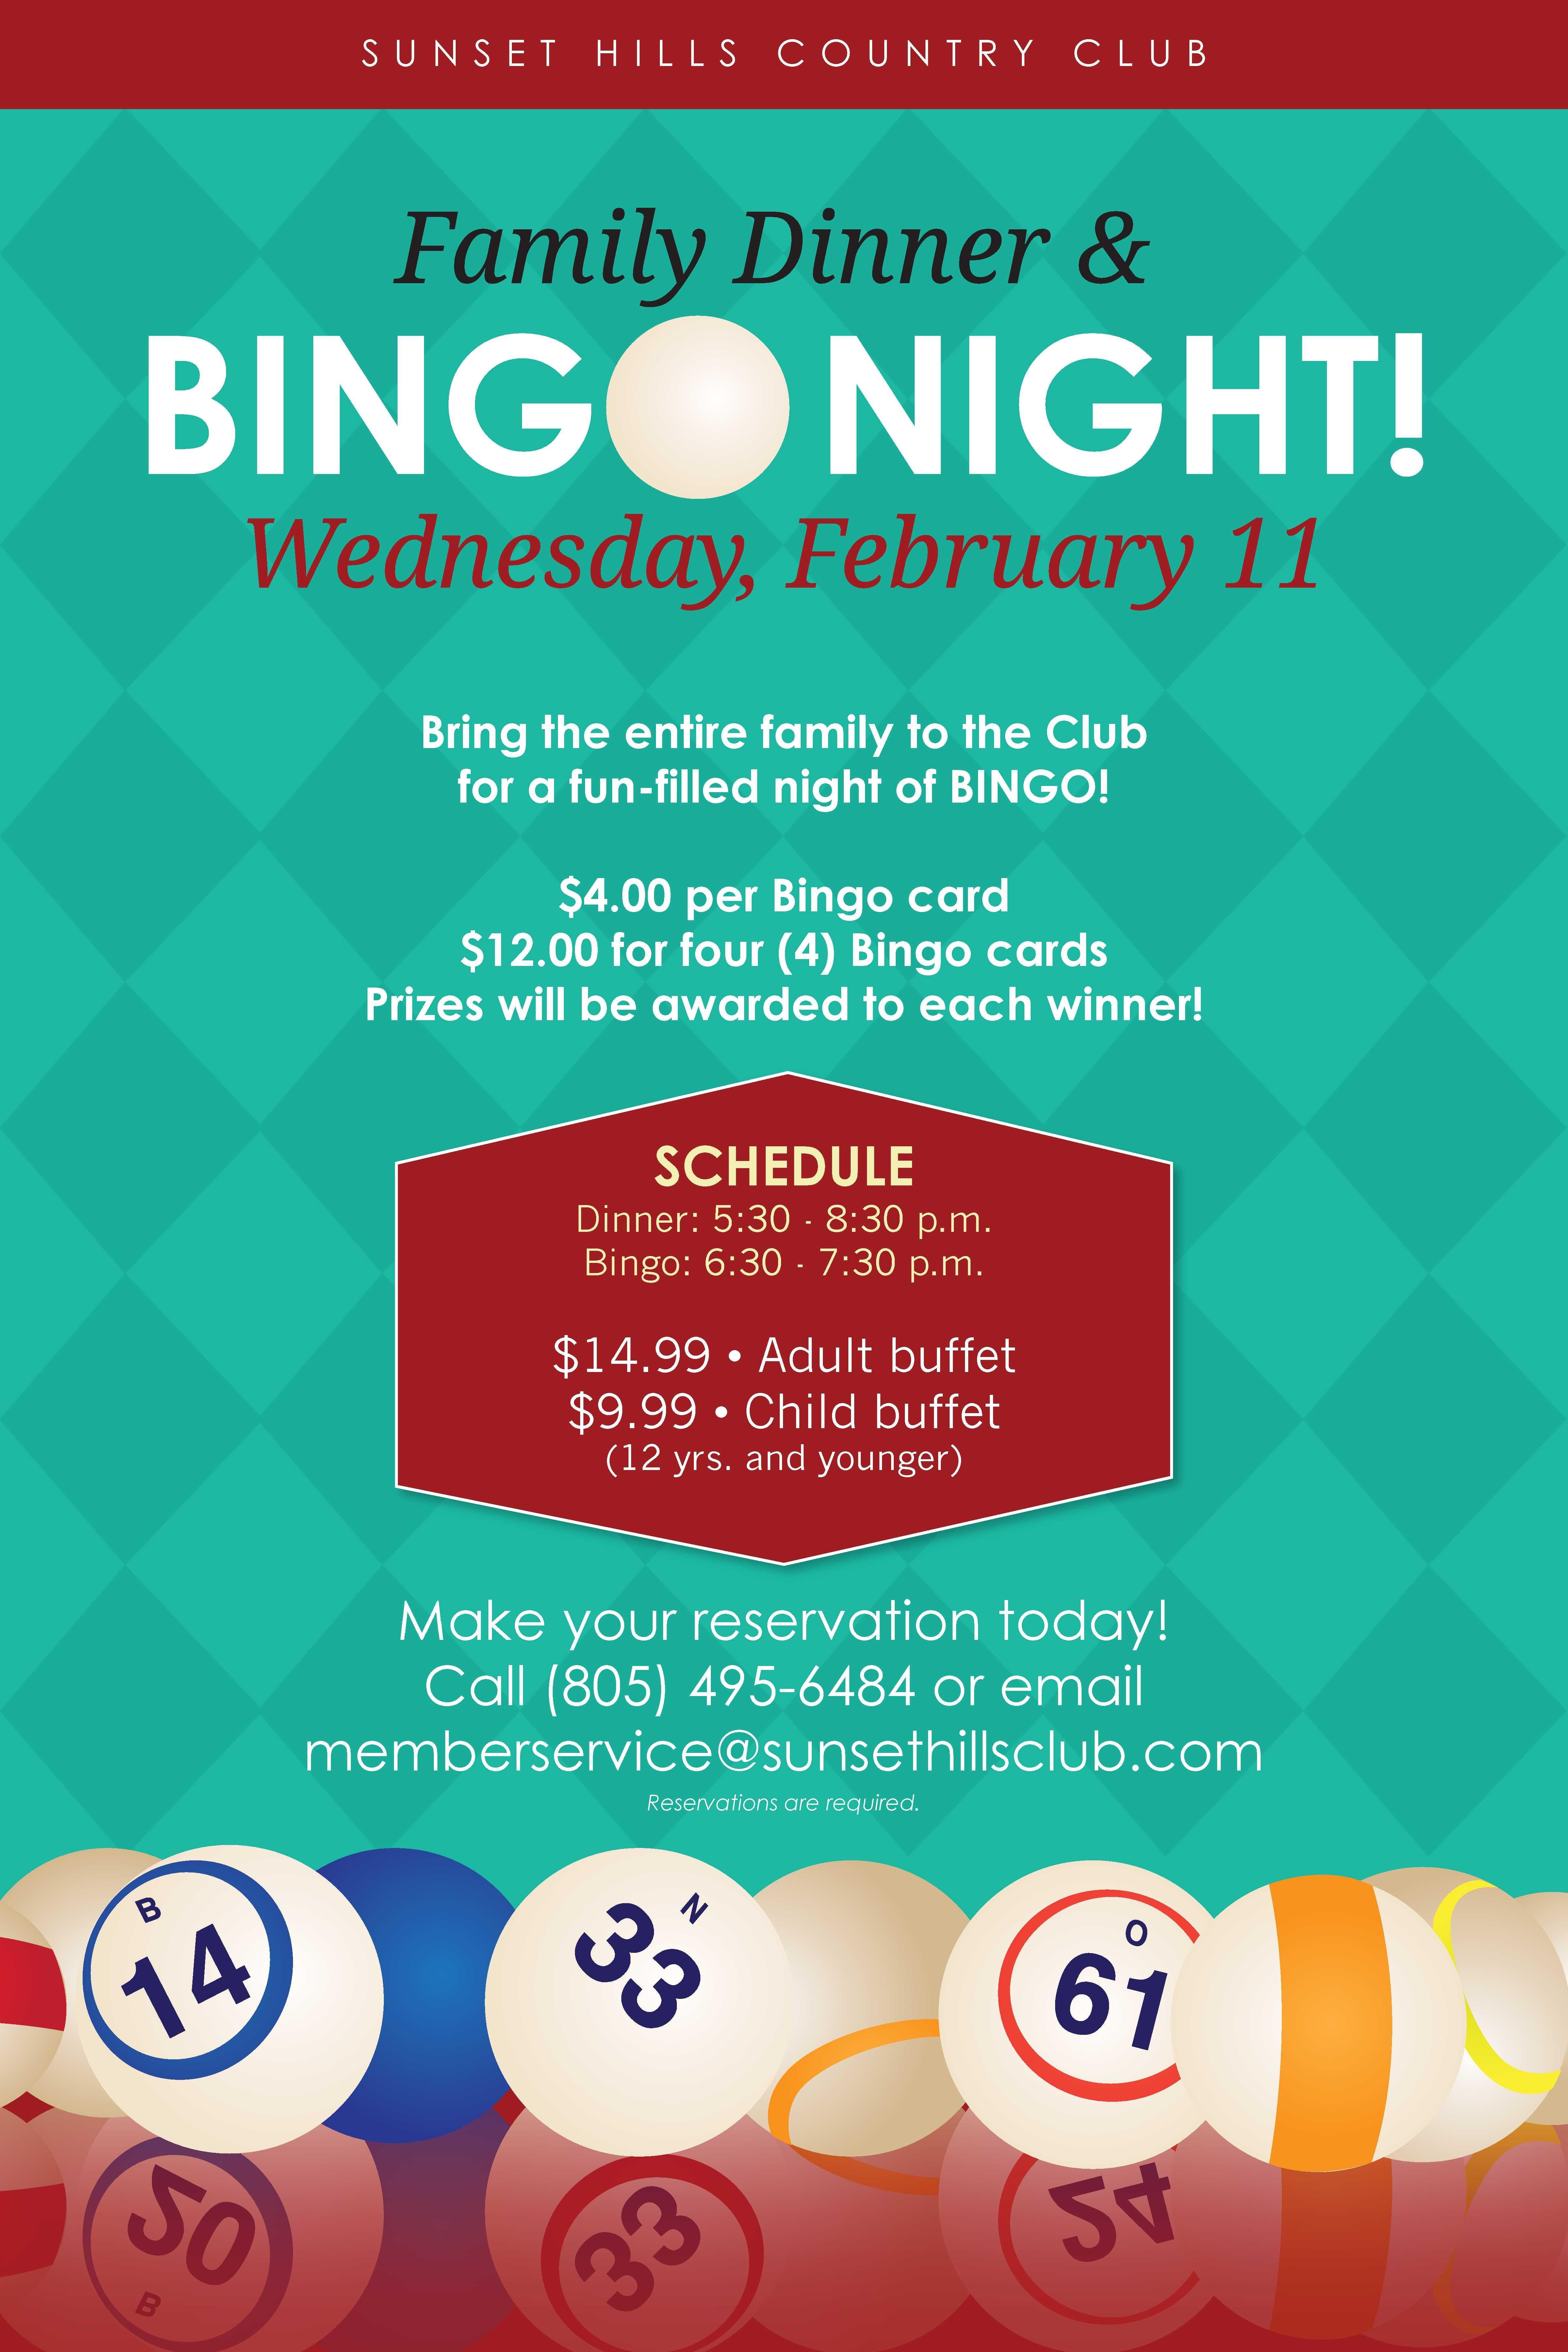 bingo night at sunset hills country club | kids in 2018 | pinterest